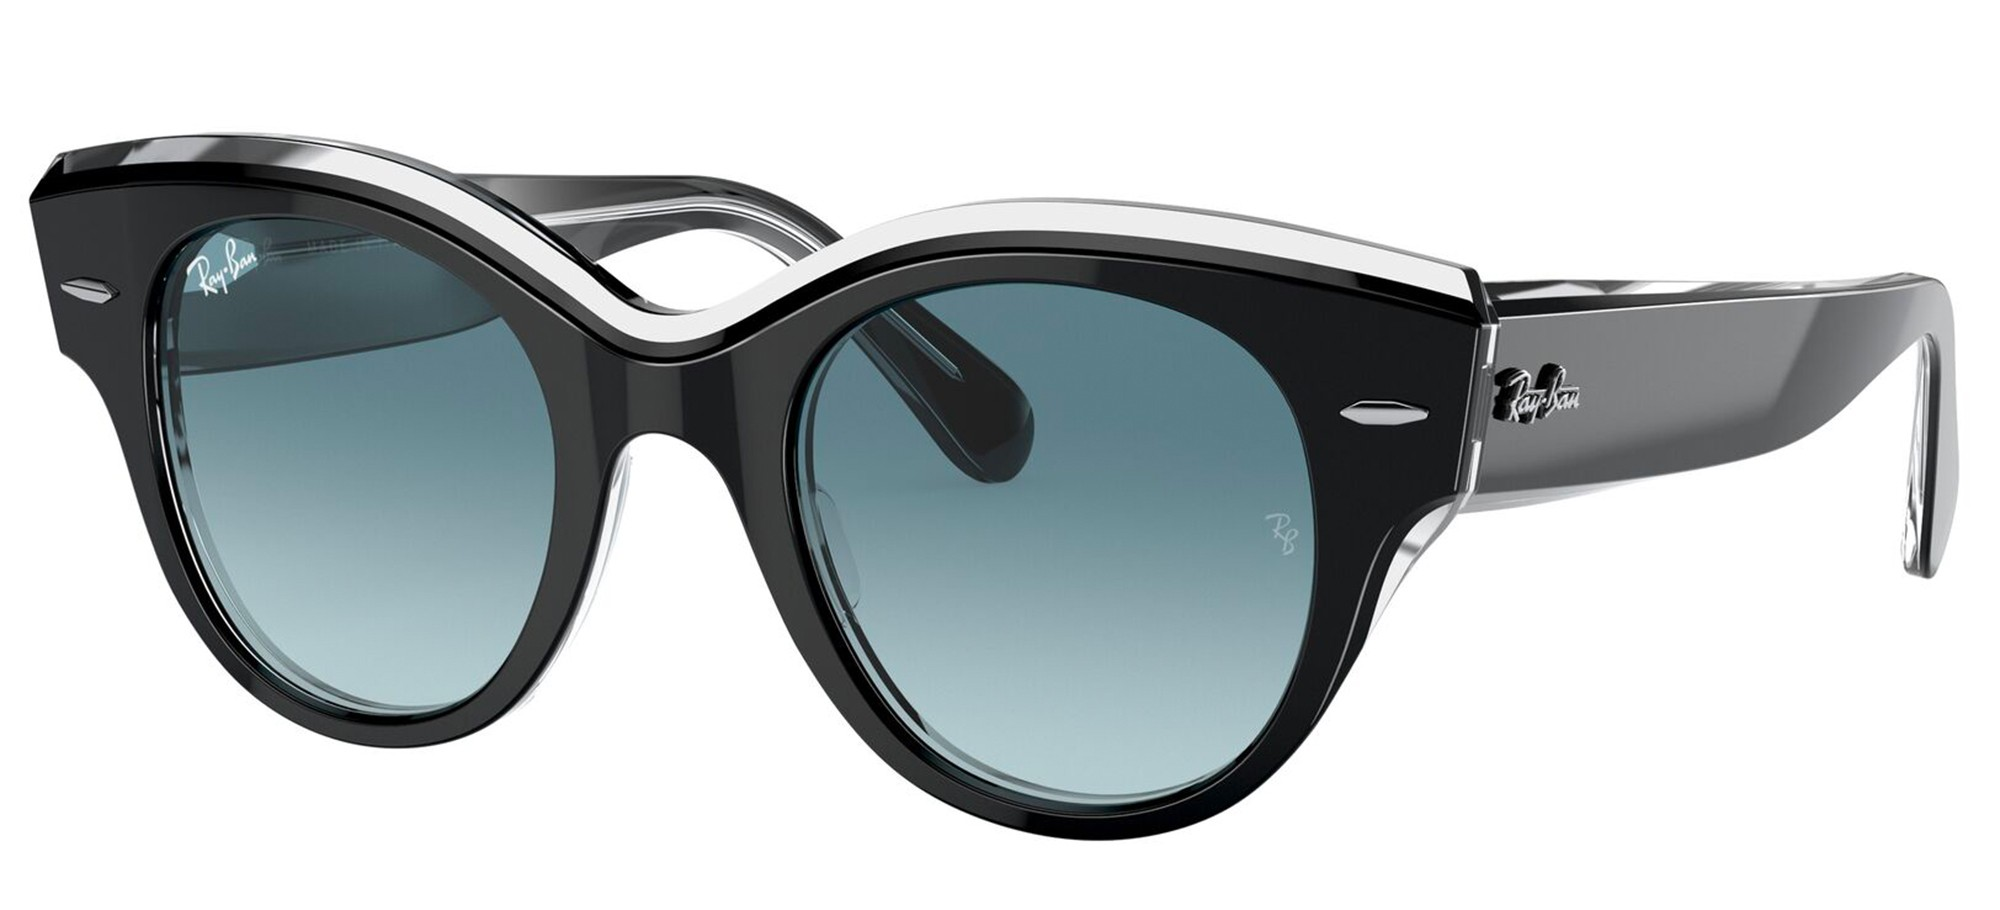 Ray Ban Roundabout 2192 12943M - Oculos de Sol